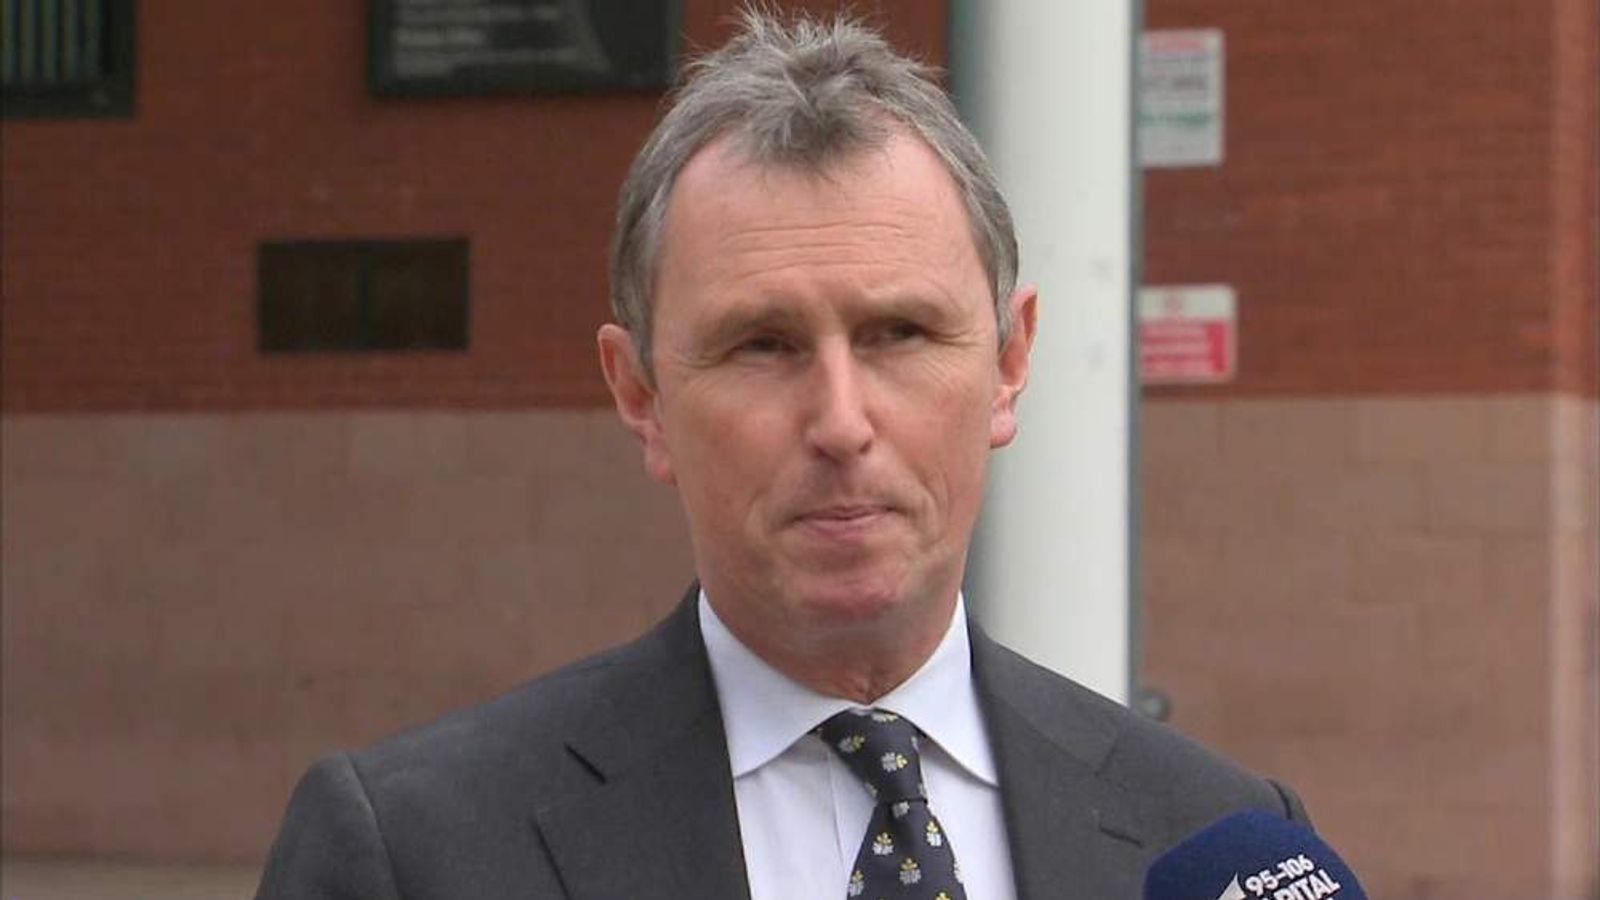 Nigel Evans on being cleared